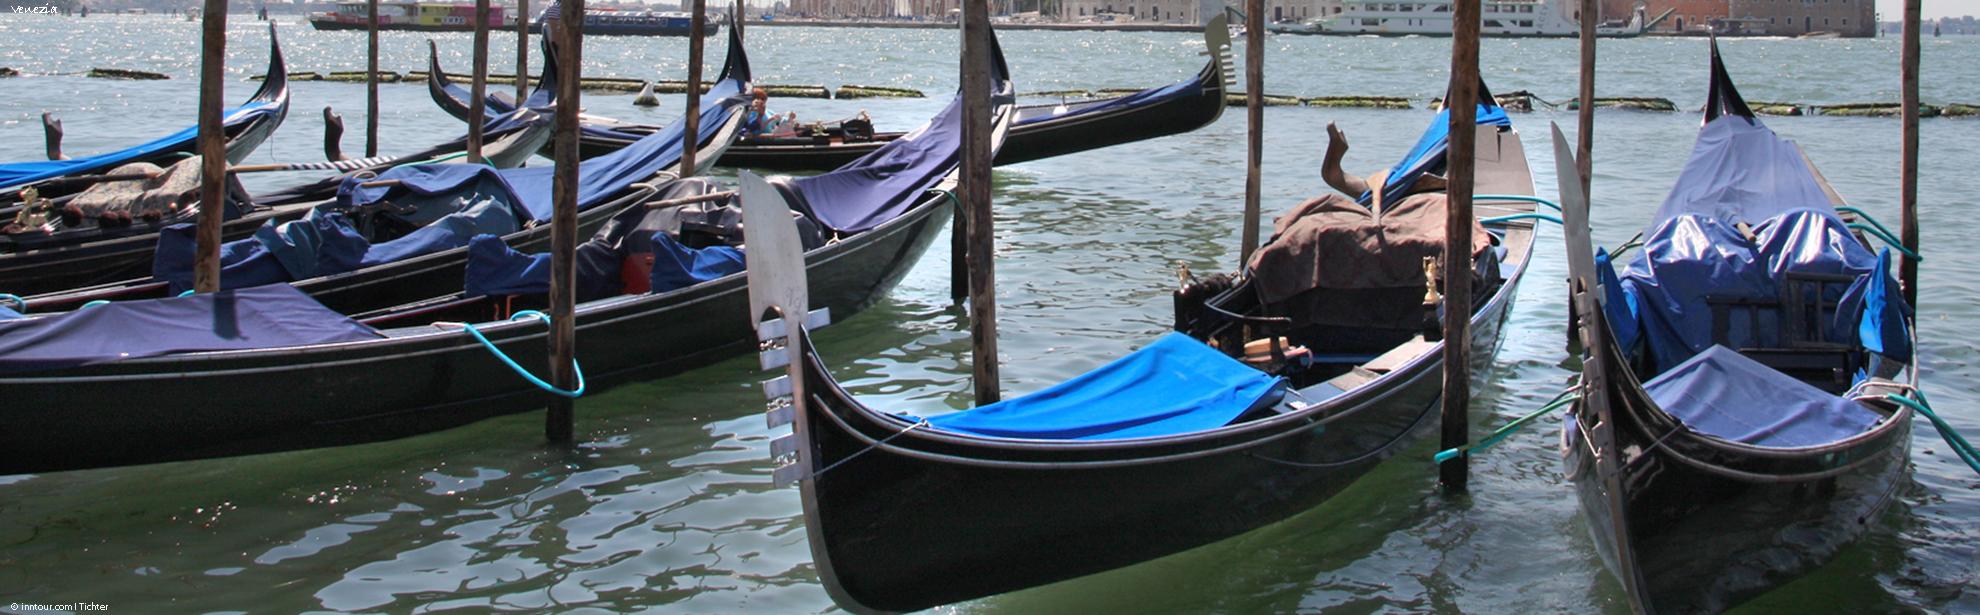 Oinntour_Tichter_Venezia_IMG_3405